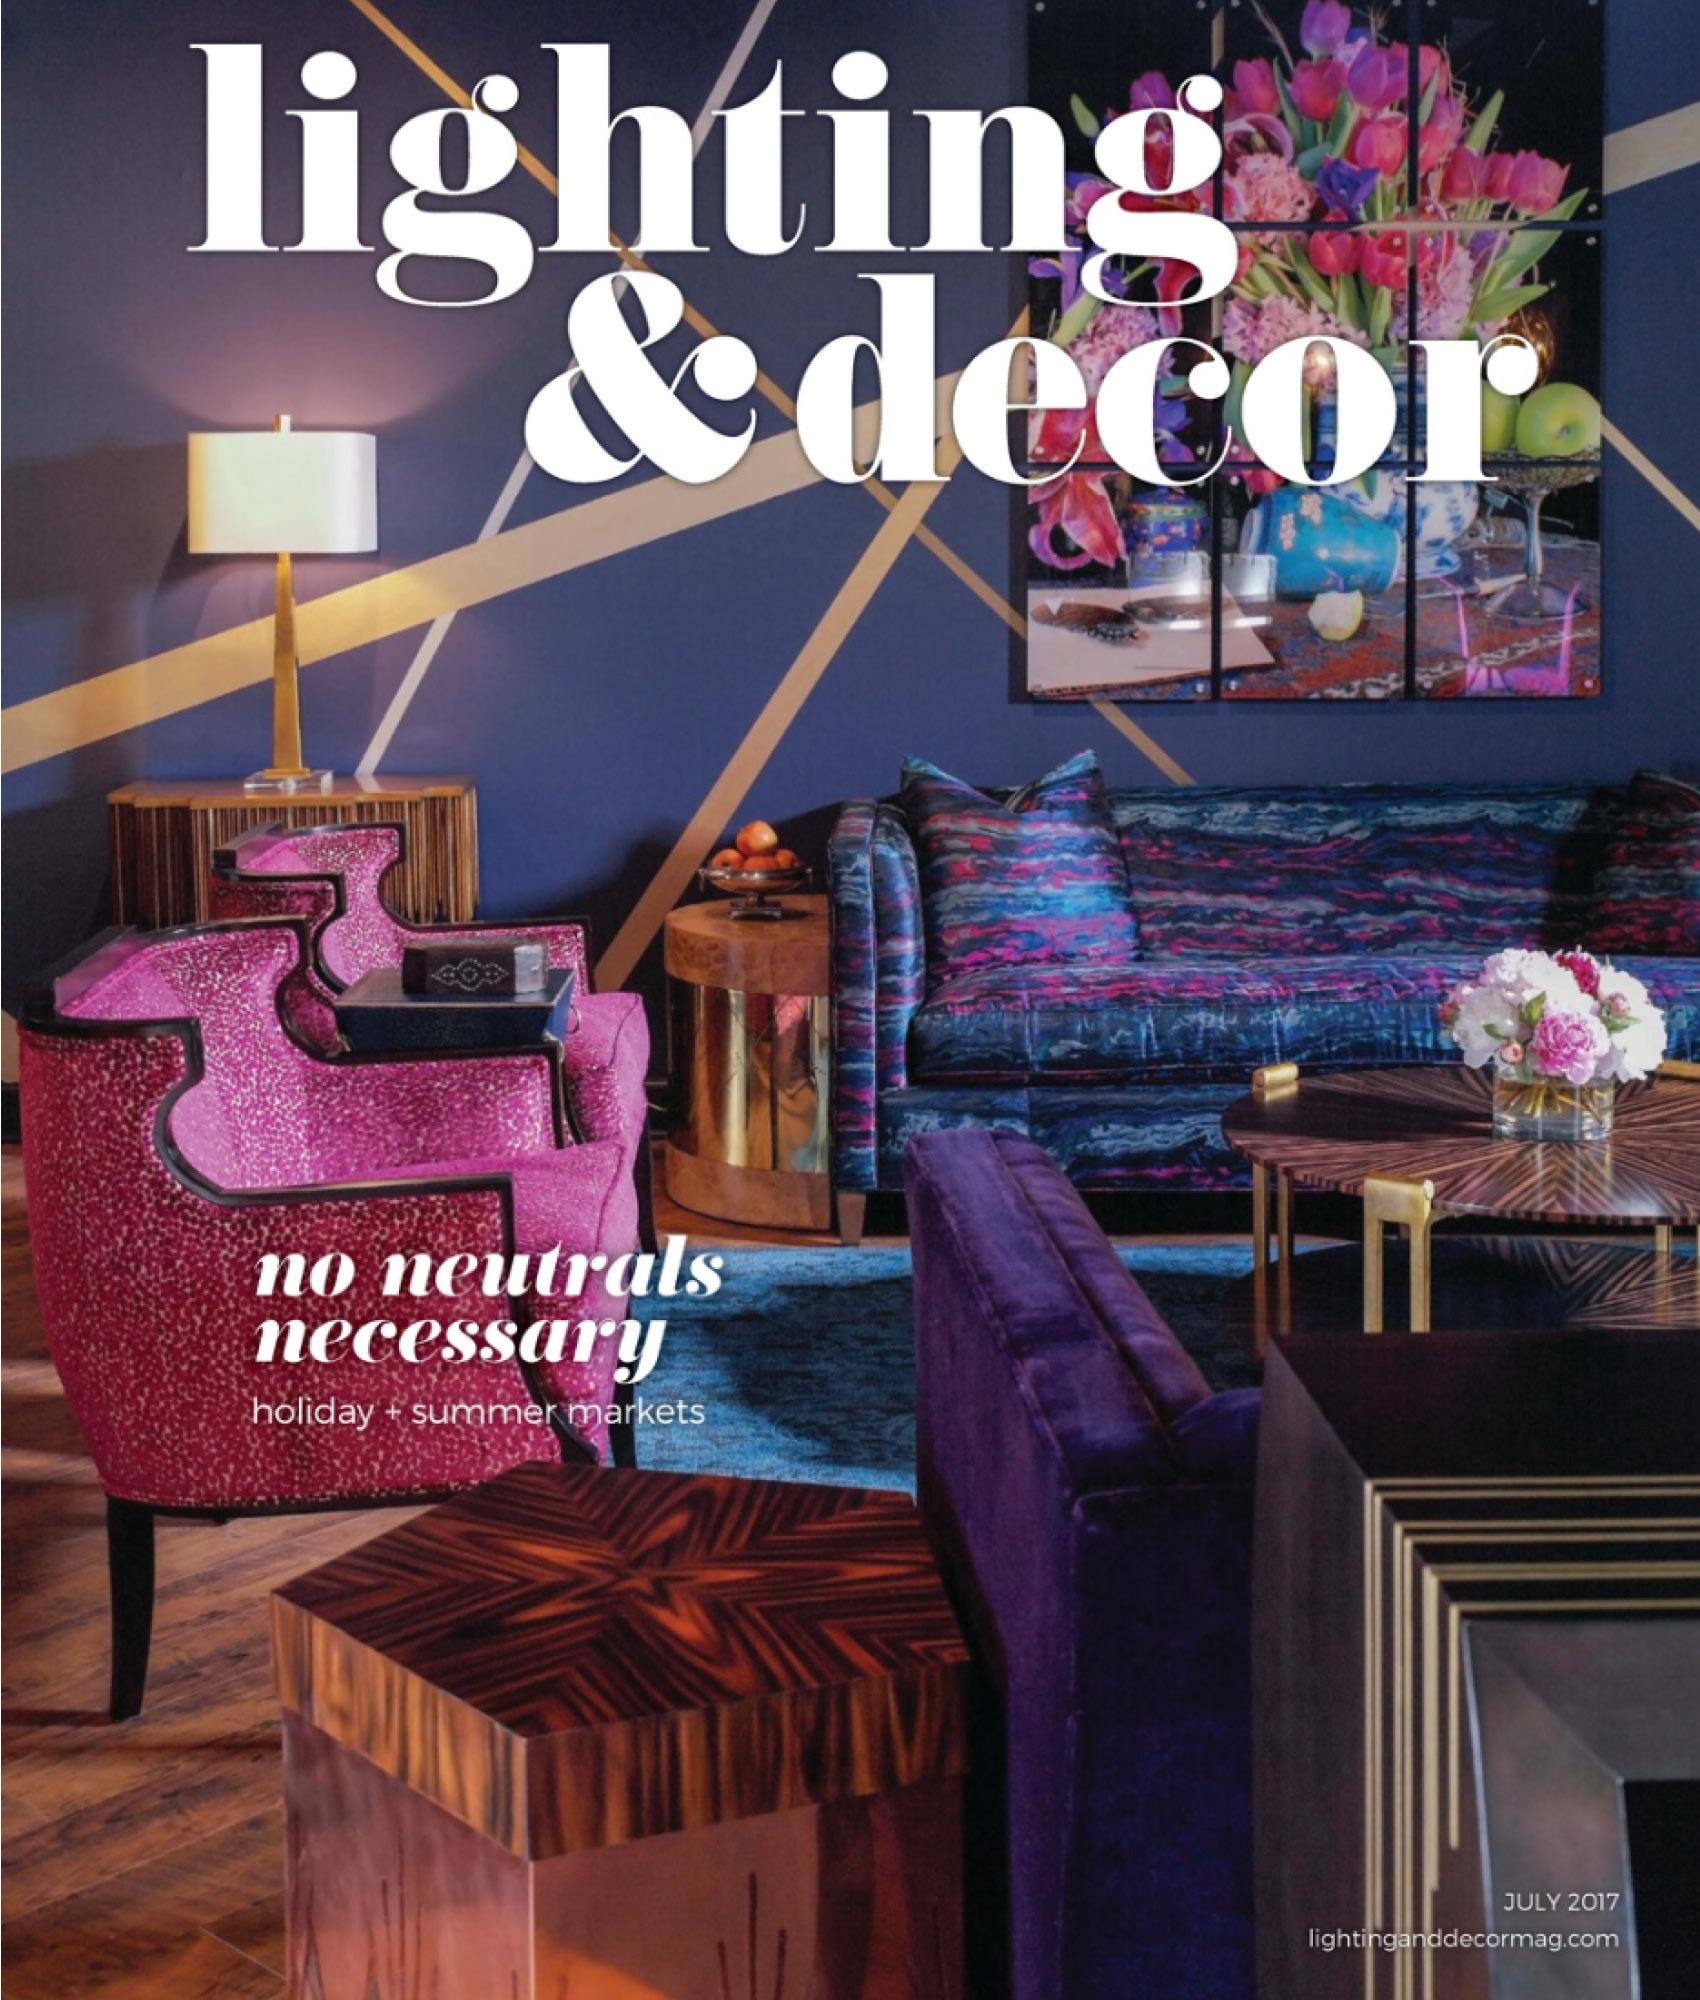 Lighting & Decor, July 2017